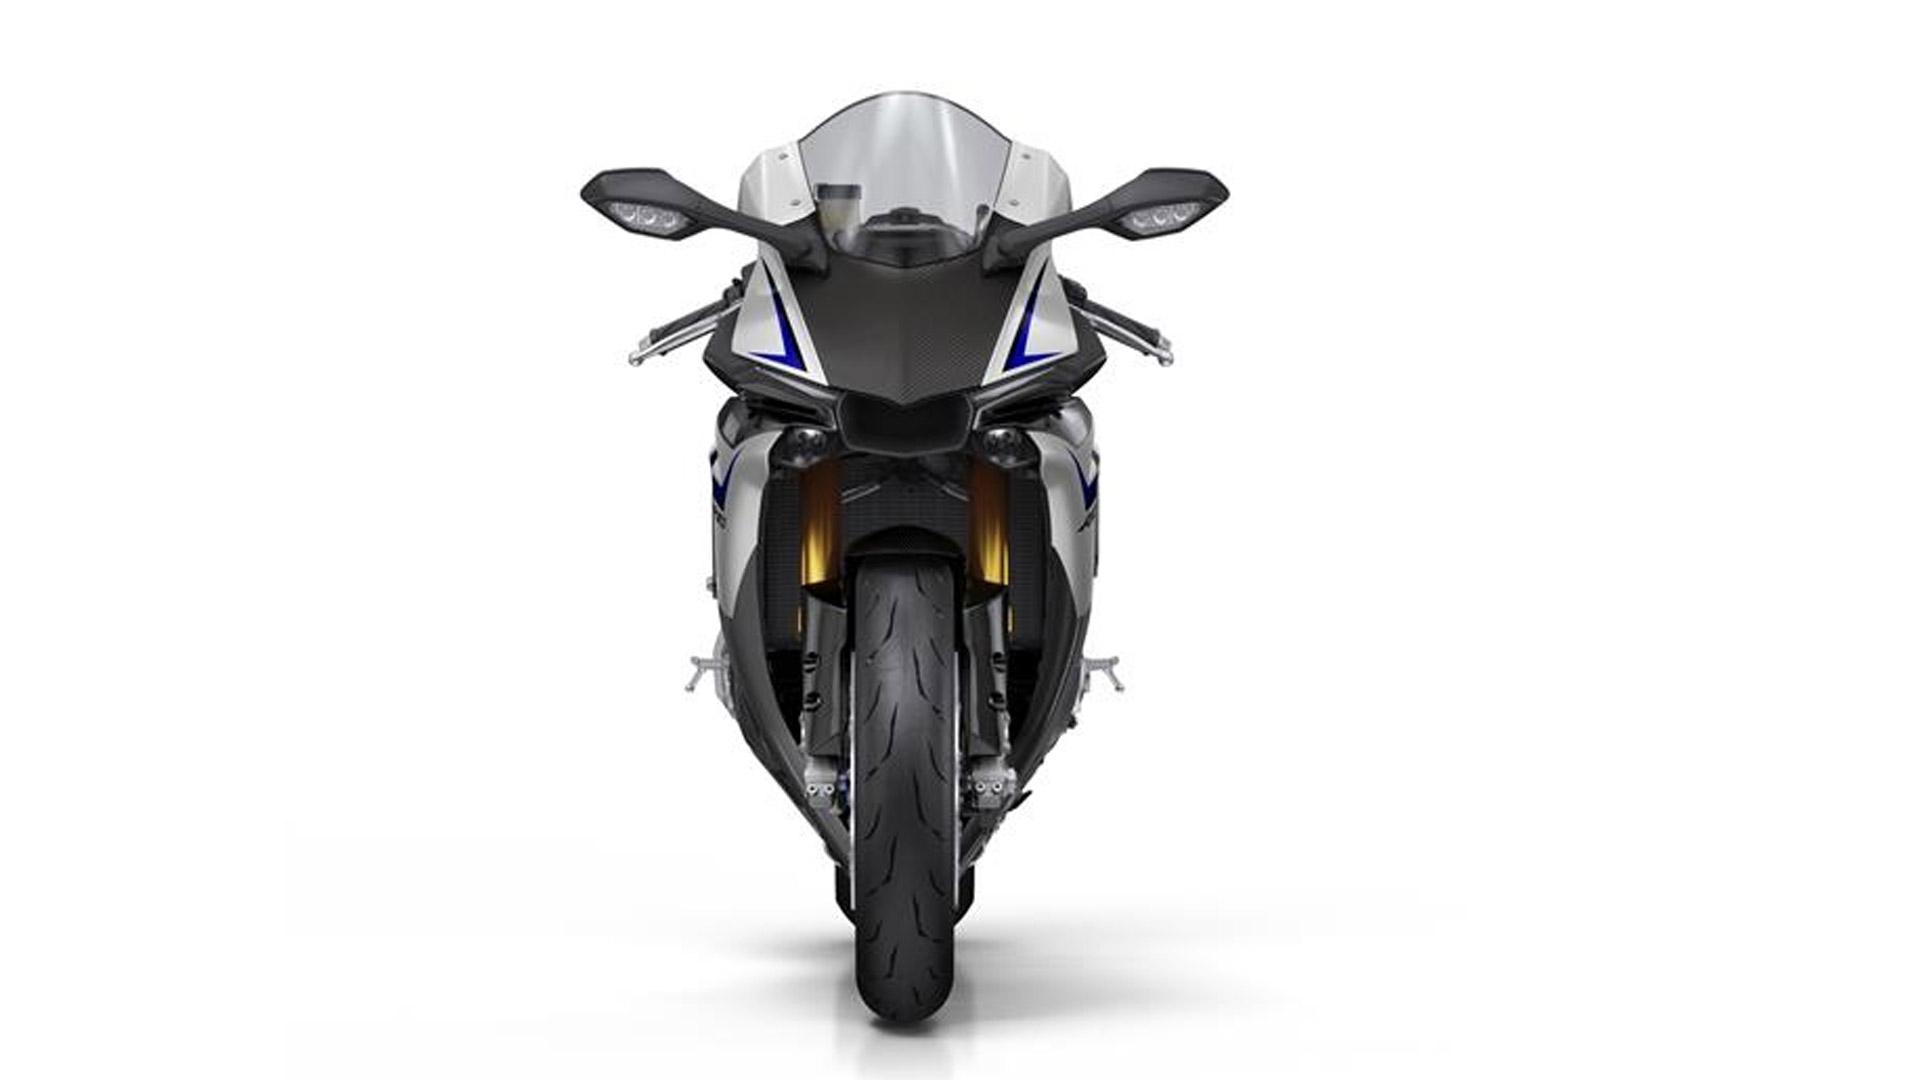 Yamaha YZF-R1 2015 M Compare